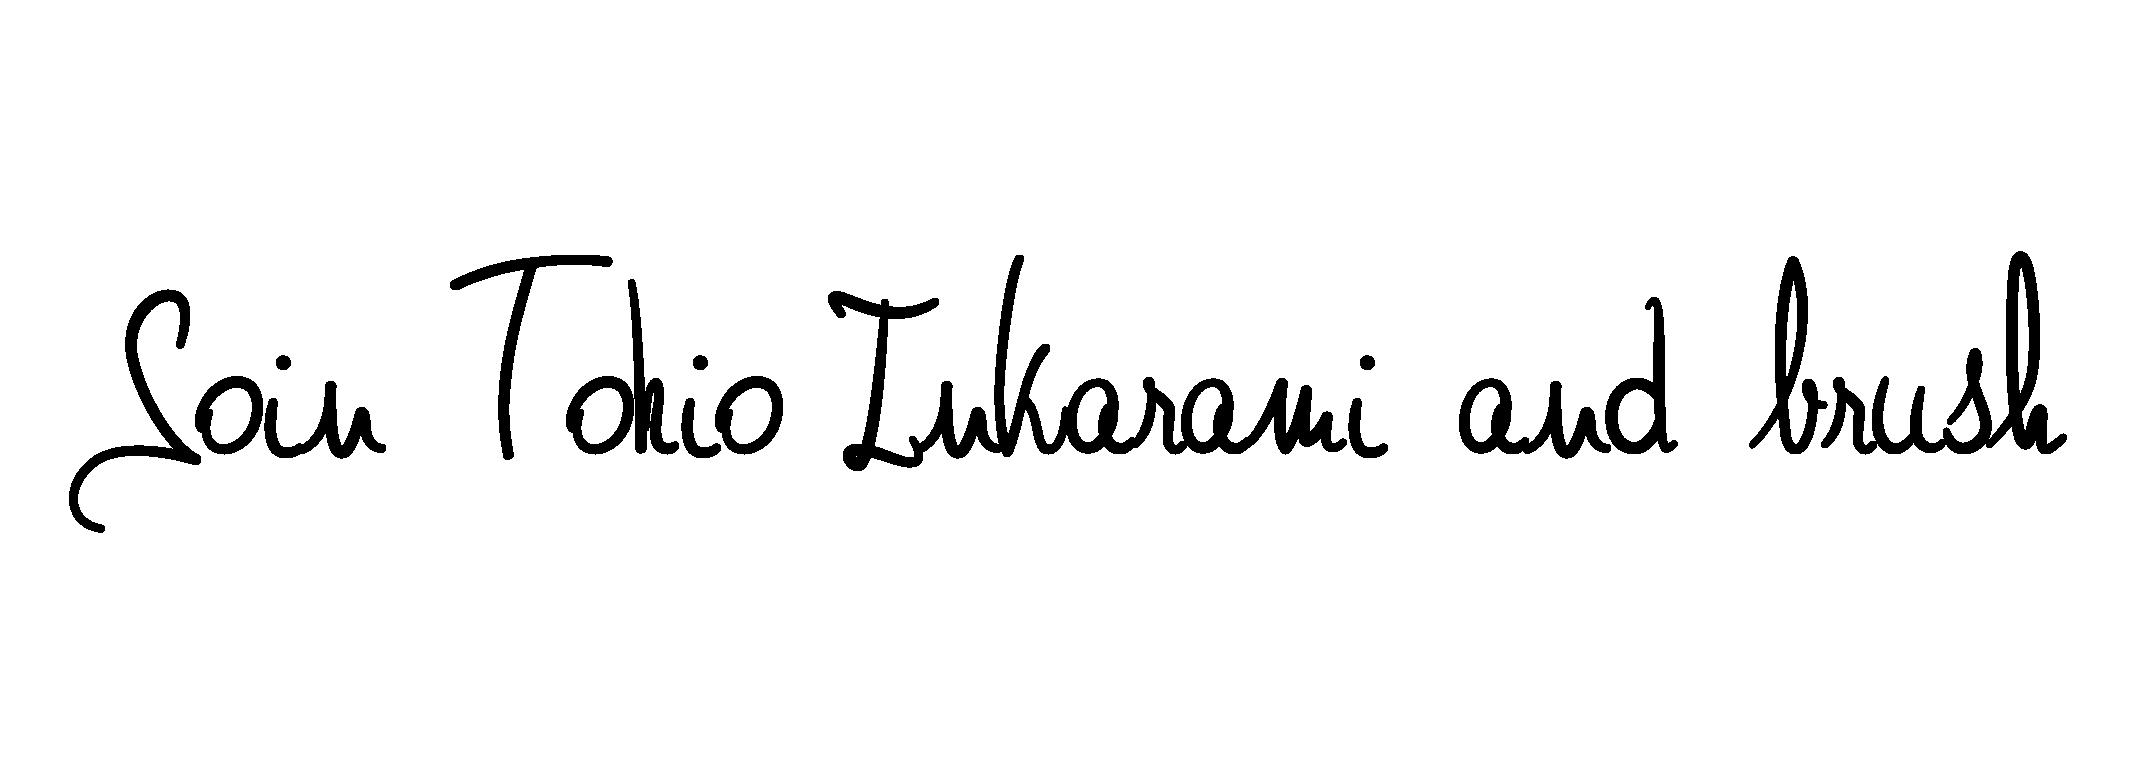 Soin-tokio